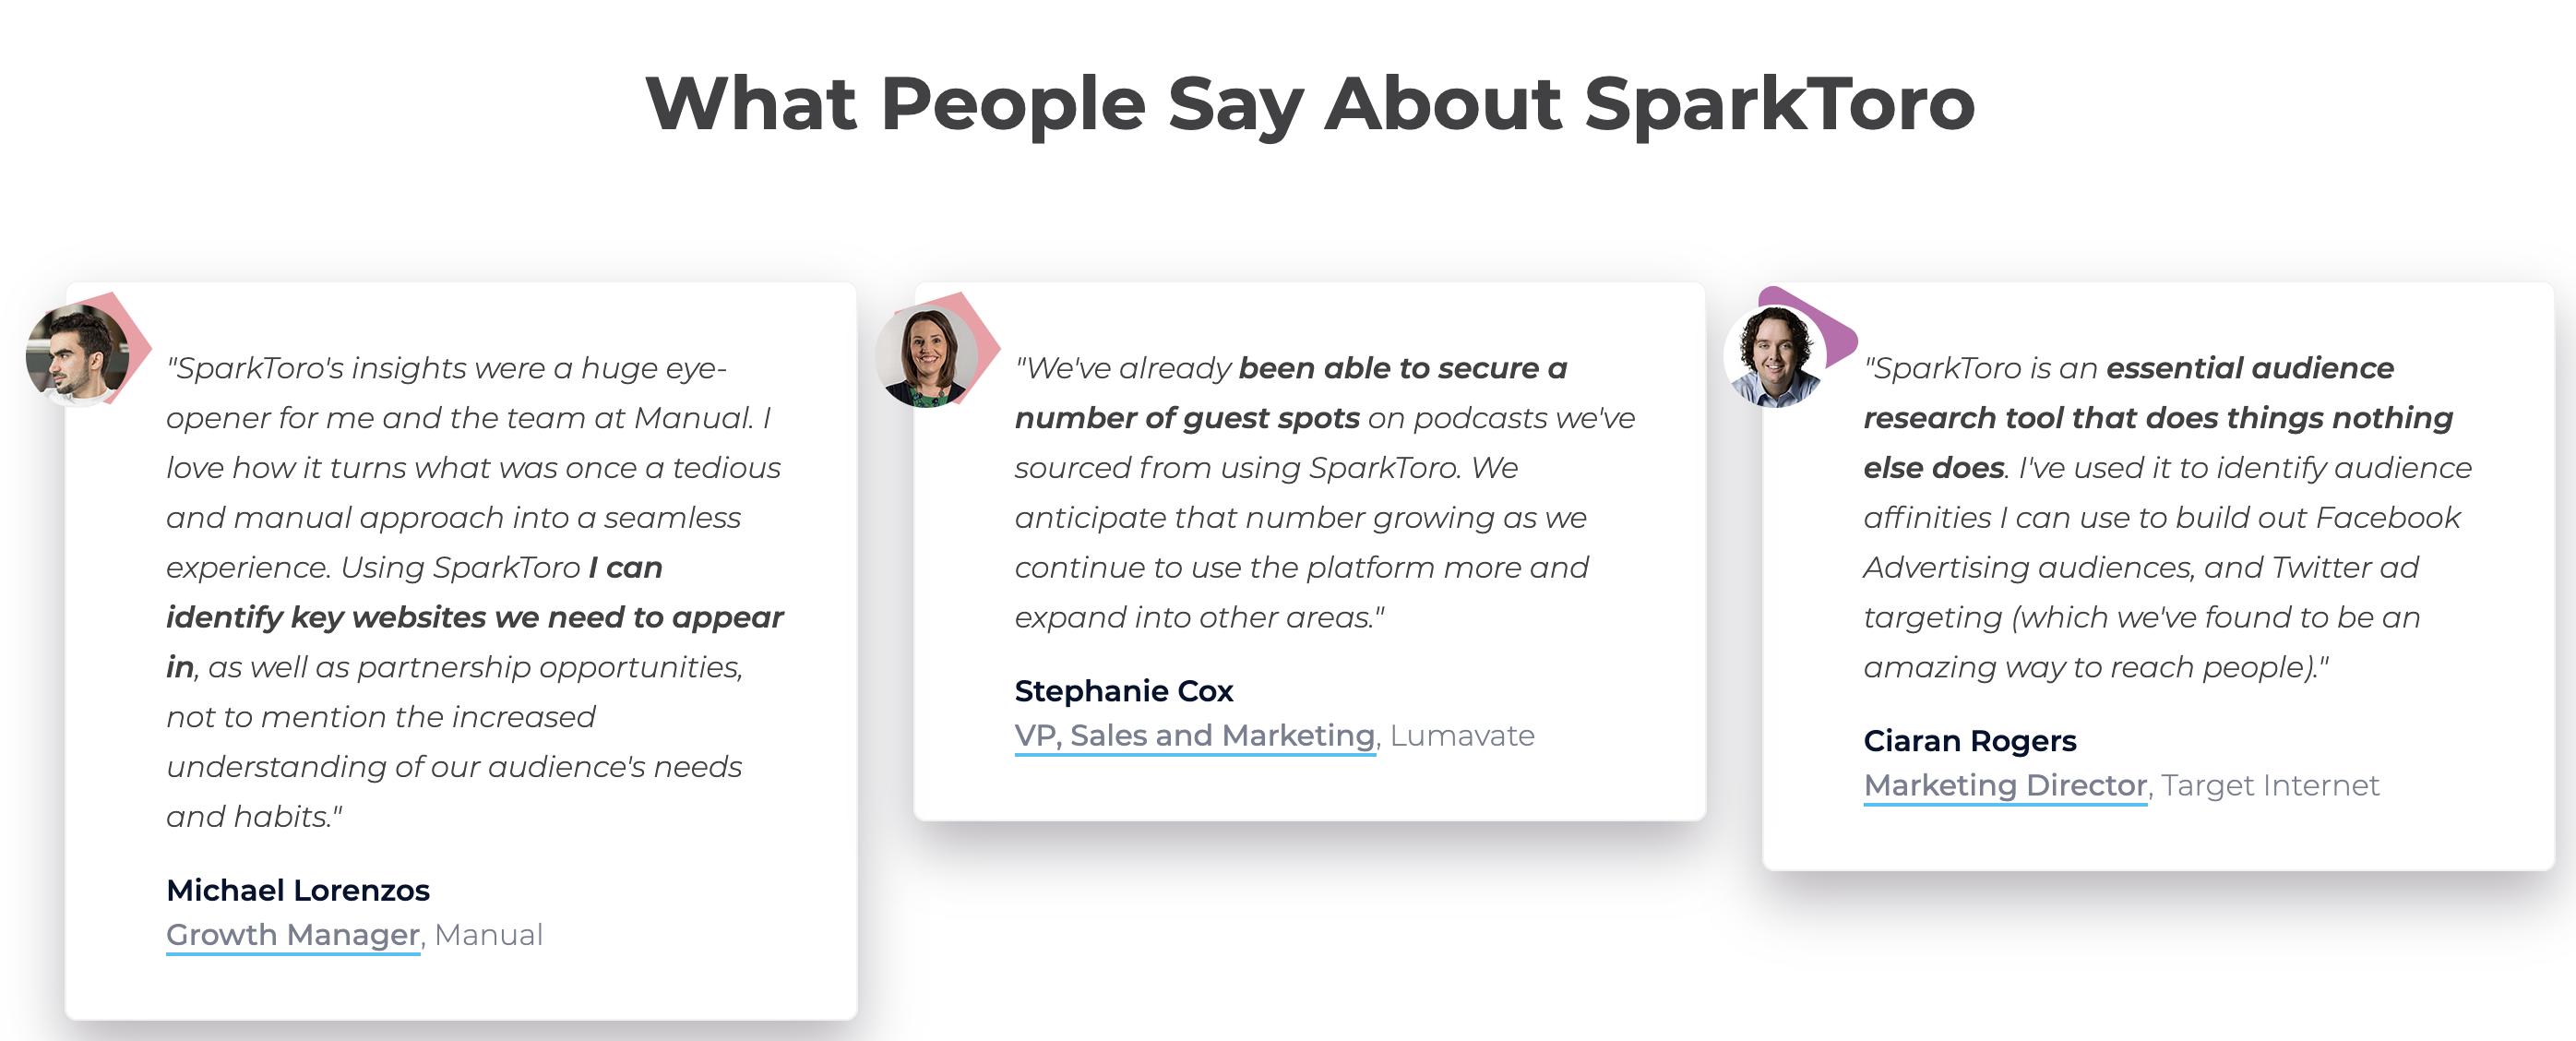 Testimonials for SparkToro